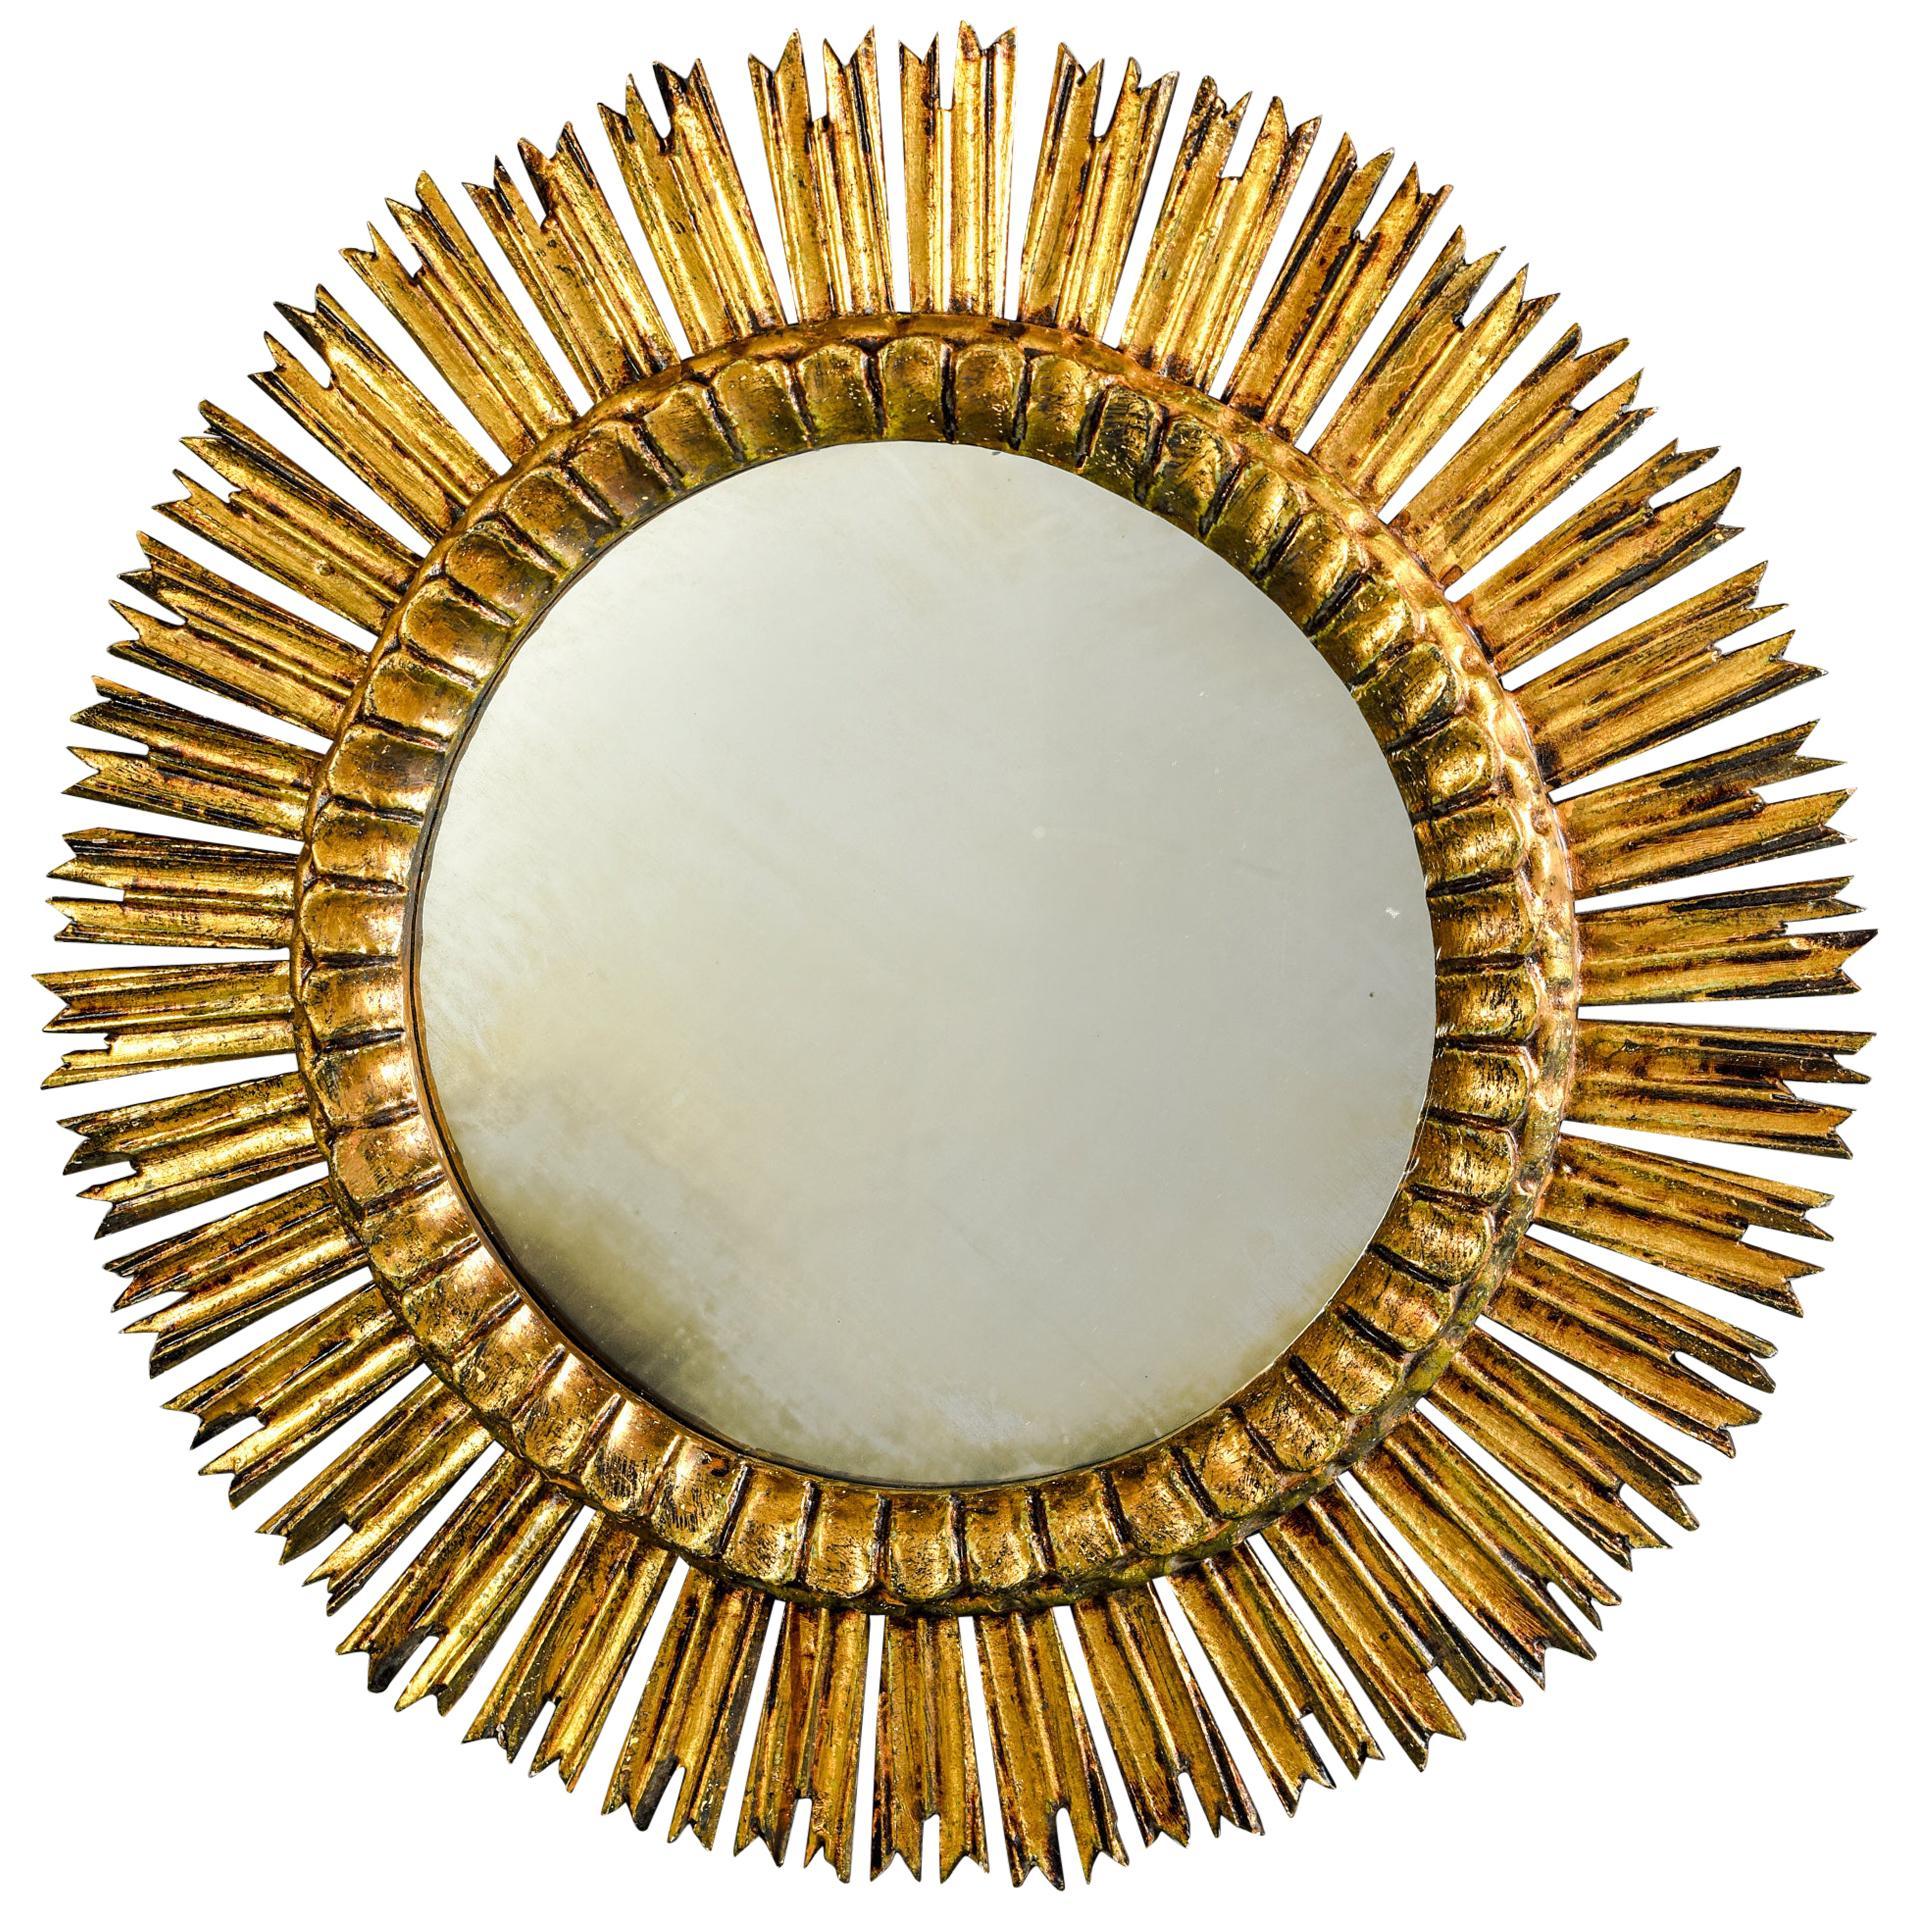 Giltwood Sunburst Mirror with Short Rays